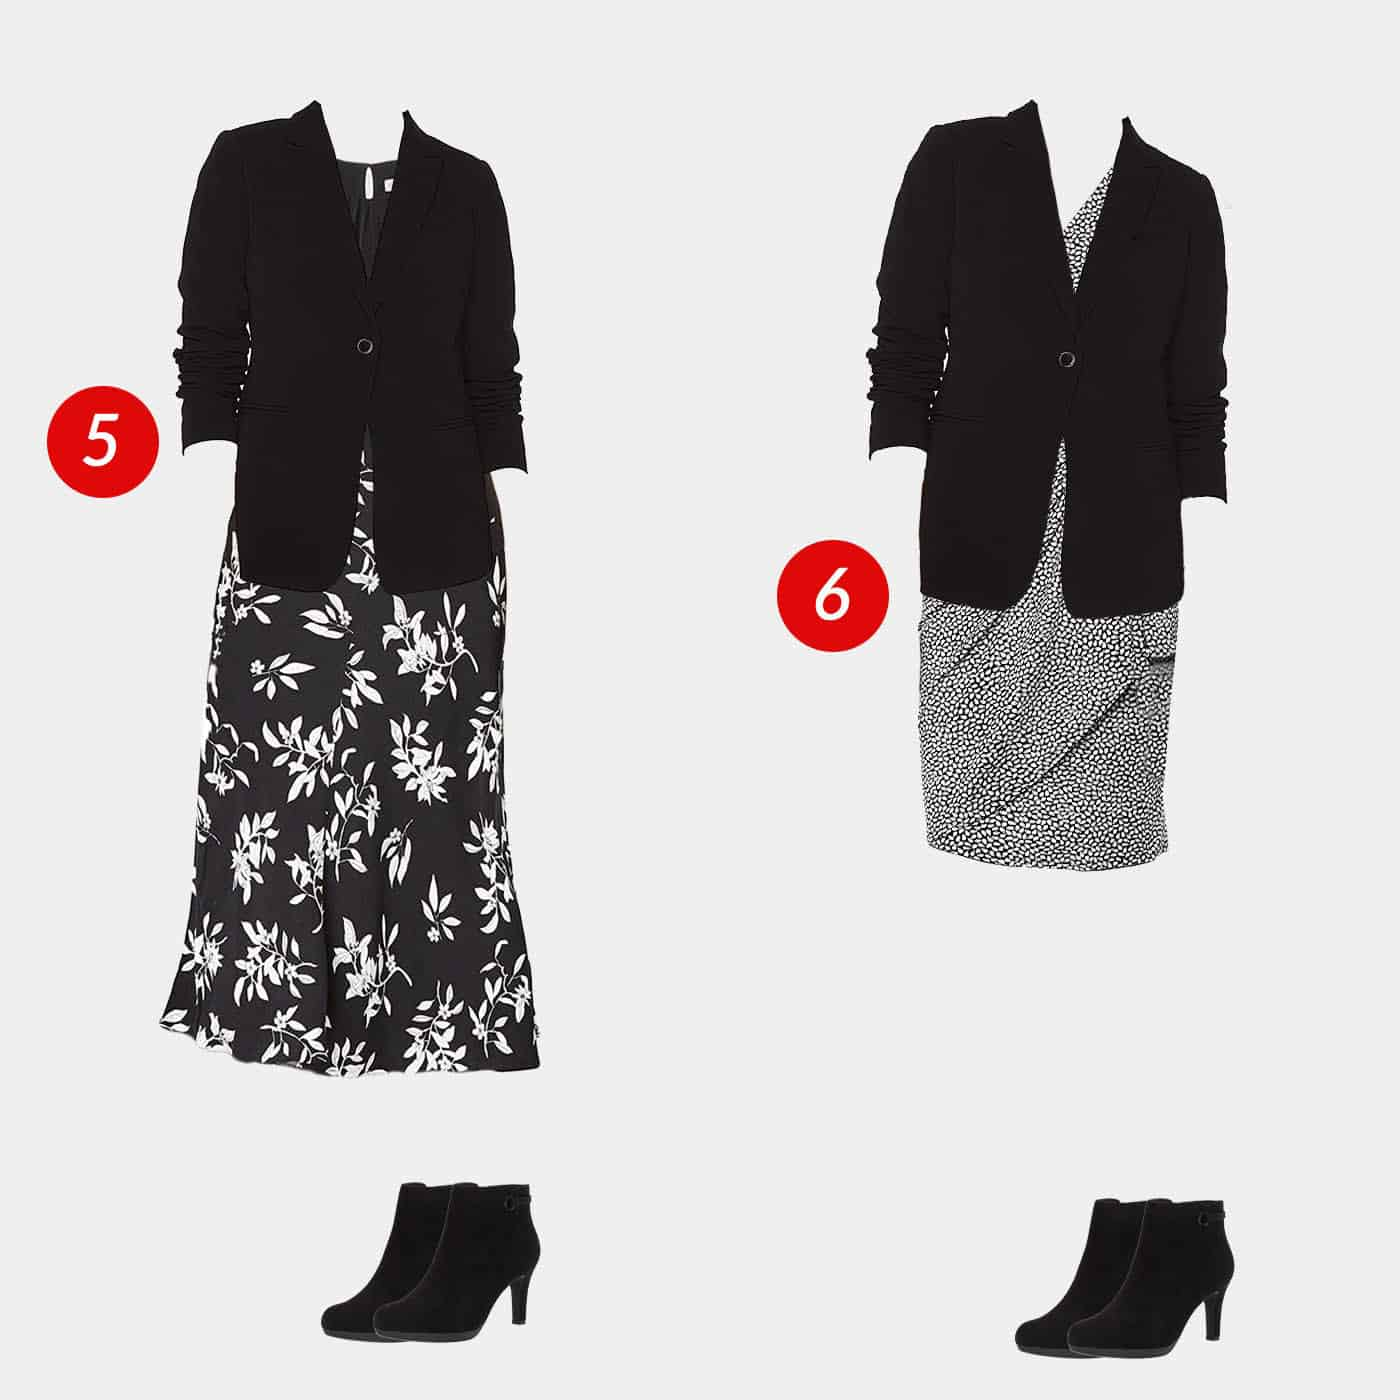 18 Piece Business Casual Amazon Capsule Wardrobe 4